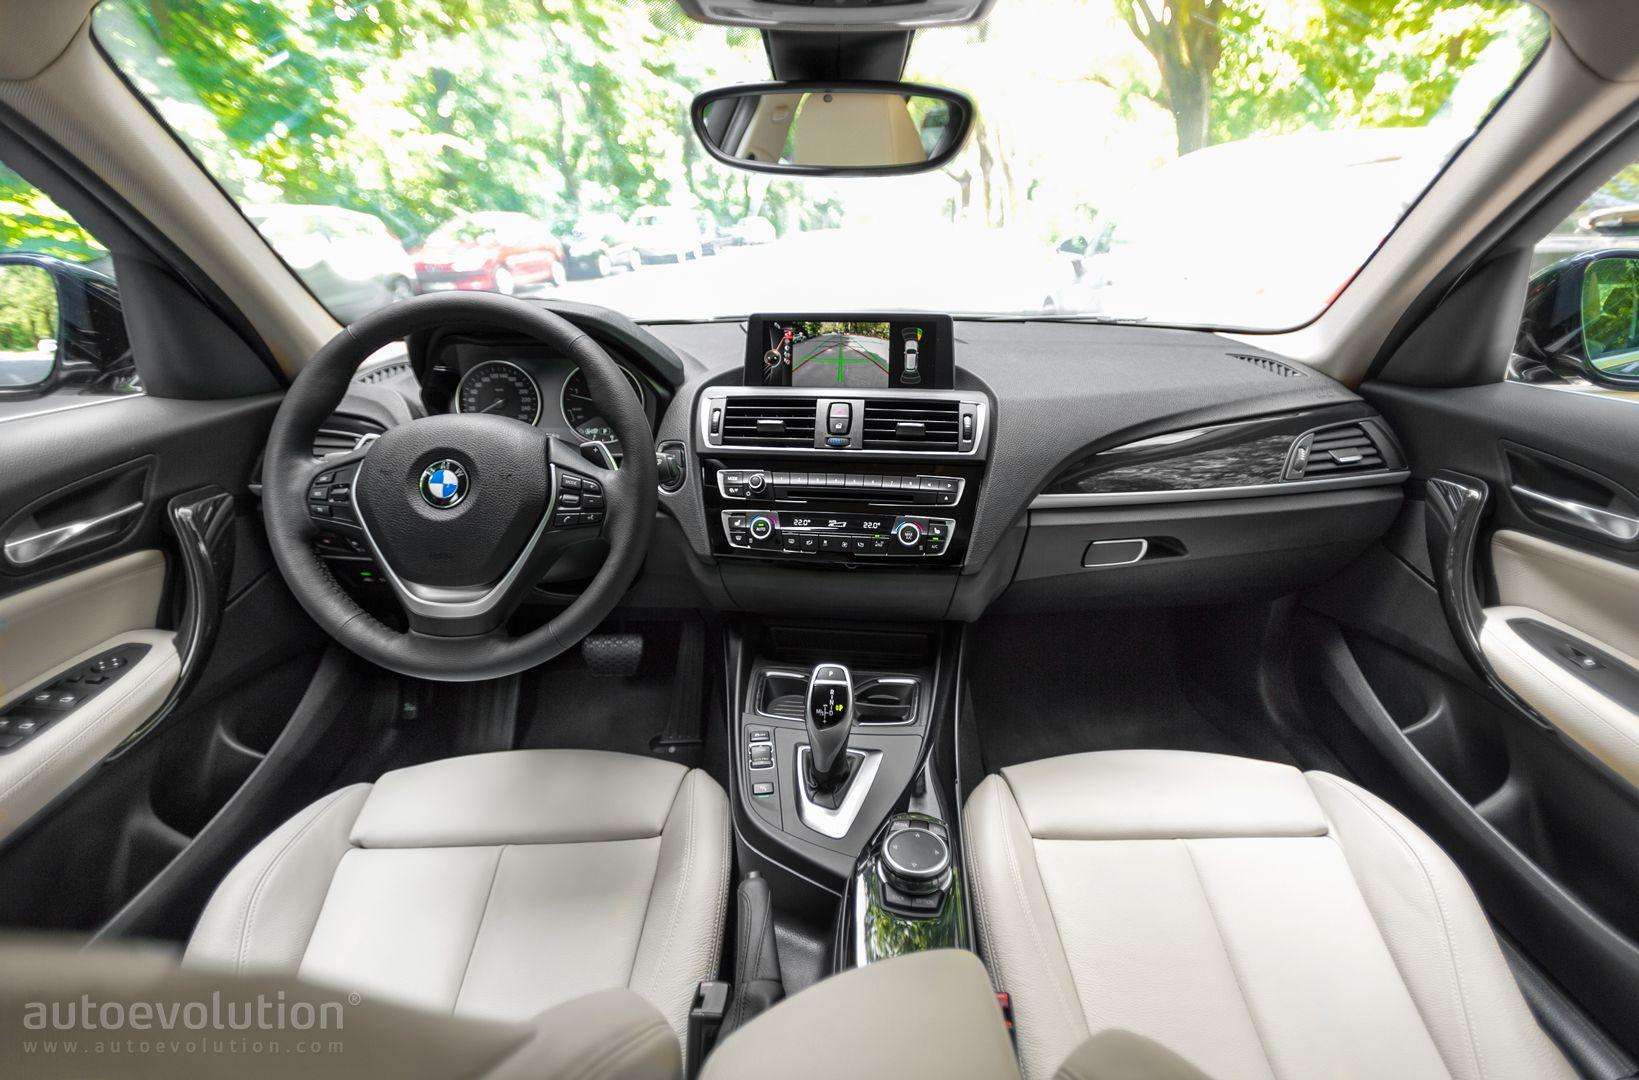 2015 bmw 1 series facelift review autoevolution